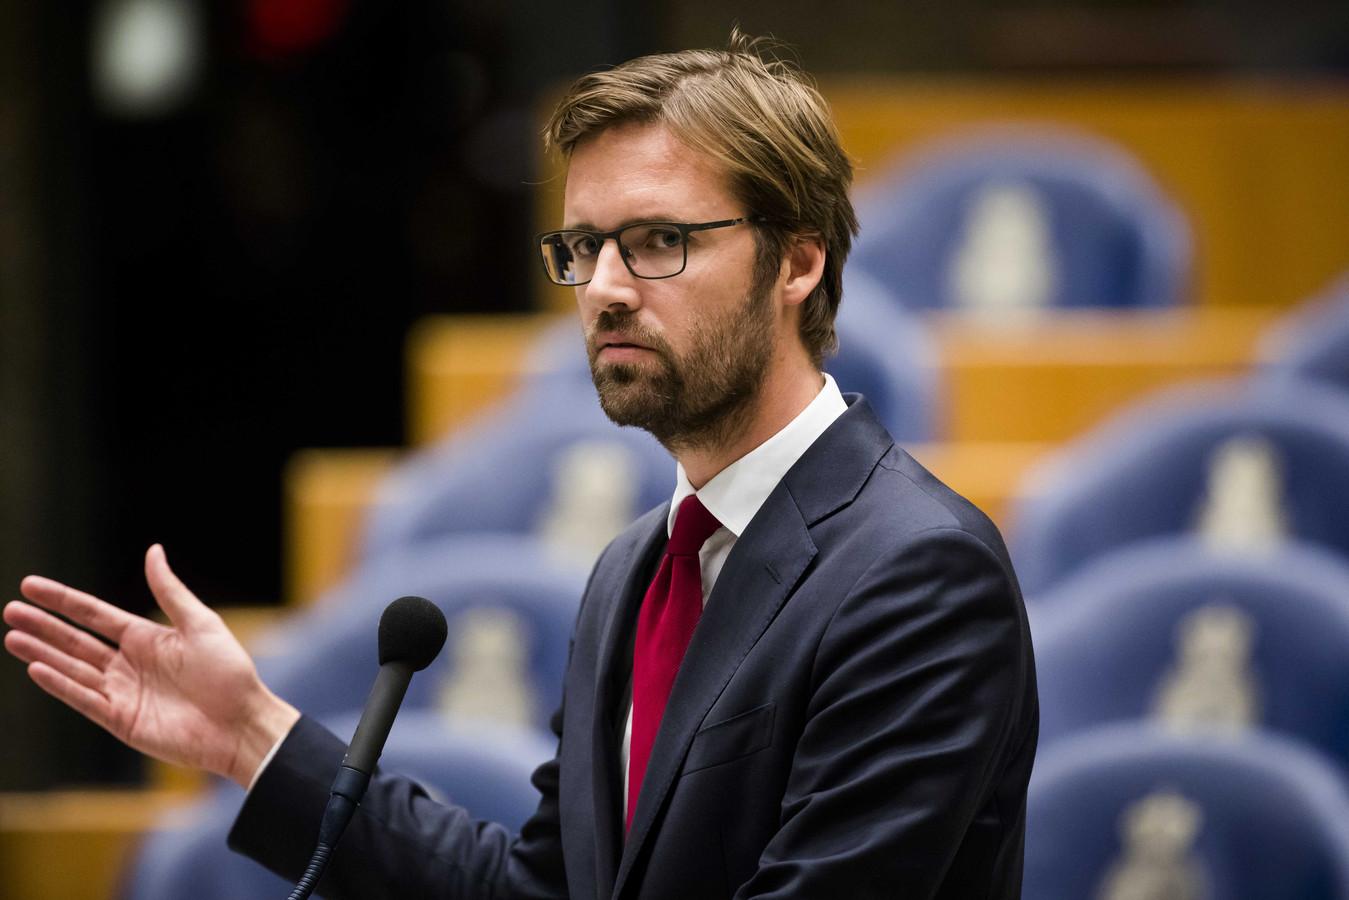 Sjoerd Sjoerdsma (D66).